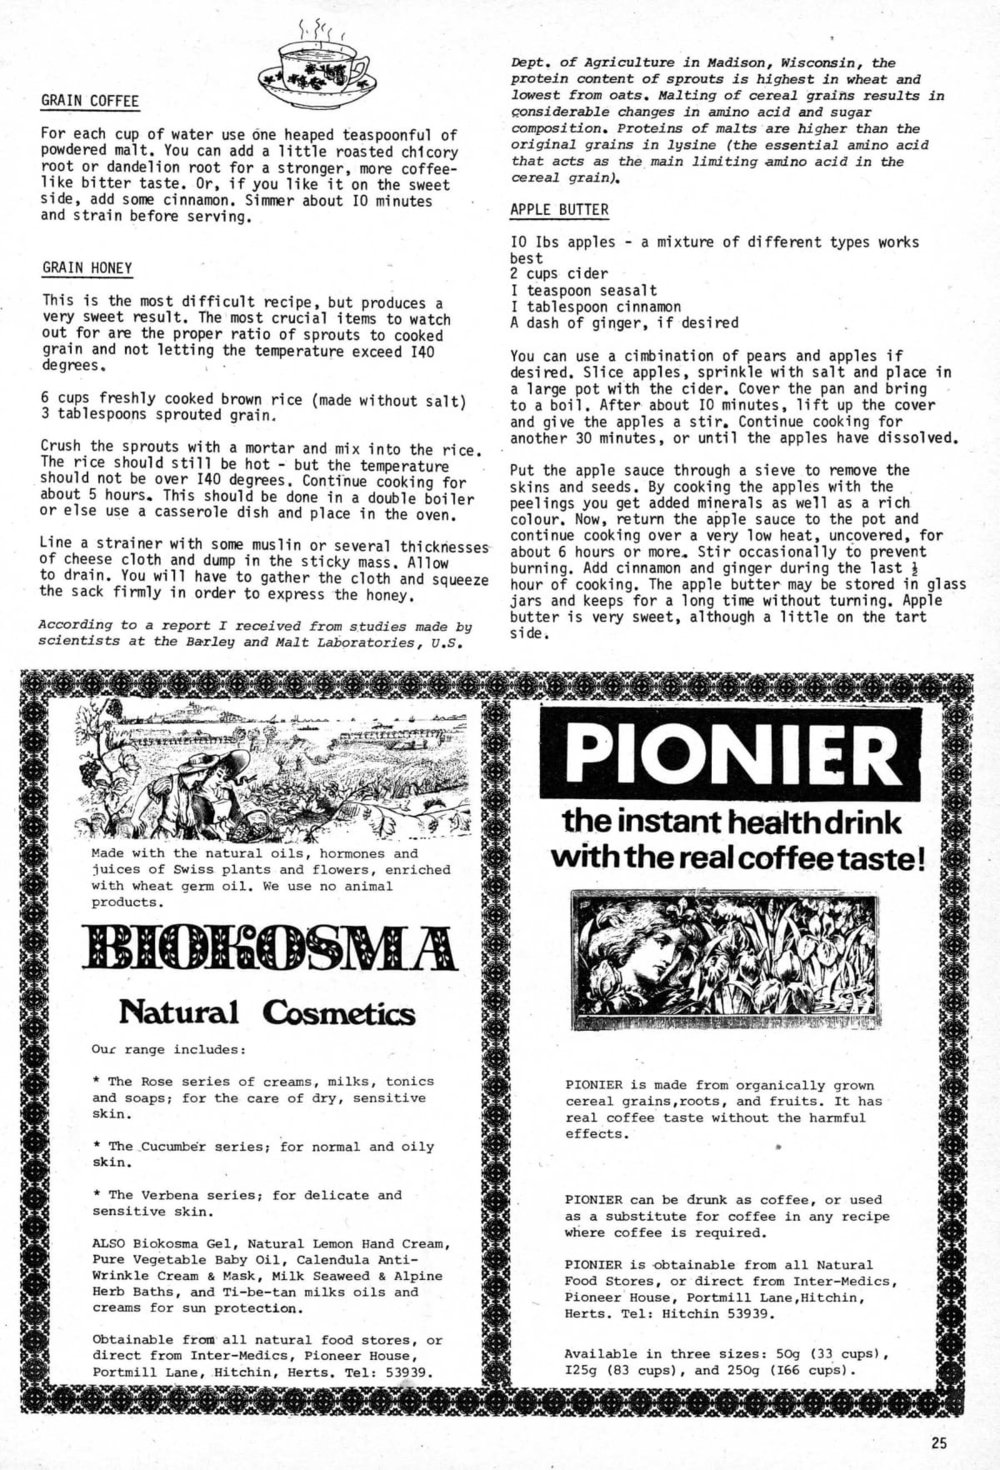 seed-v4-n5-may1975-25.jpg